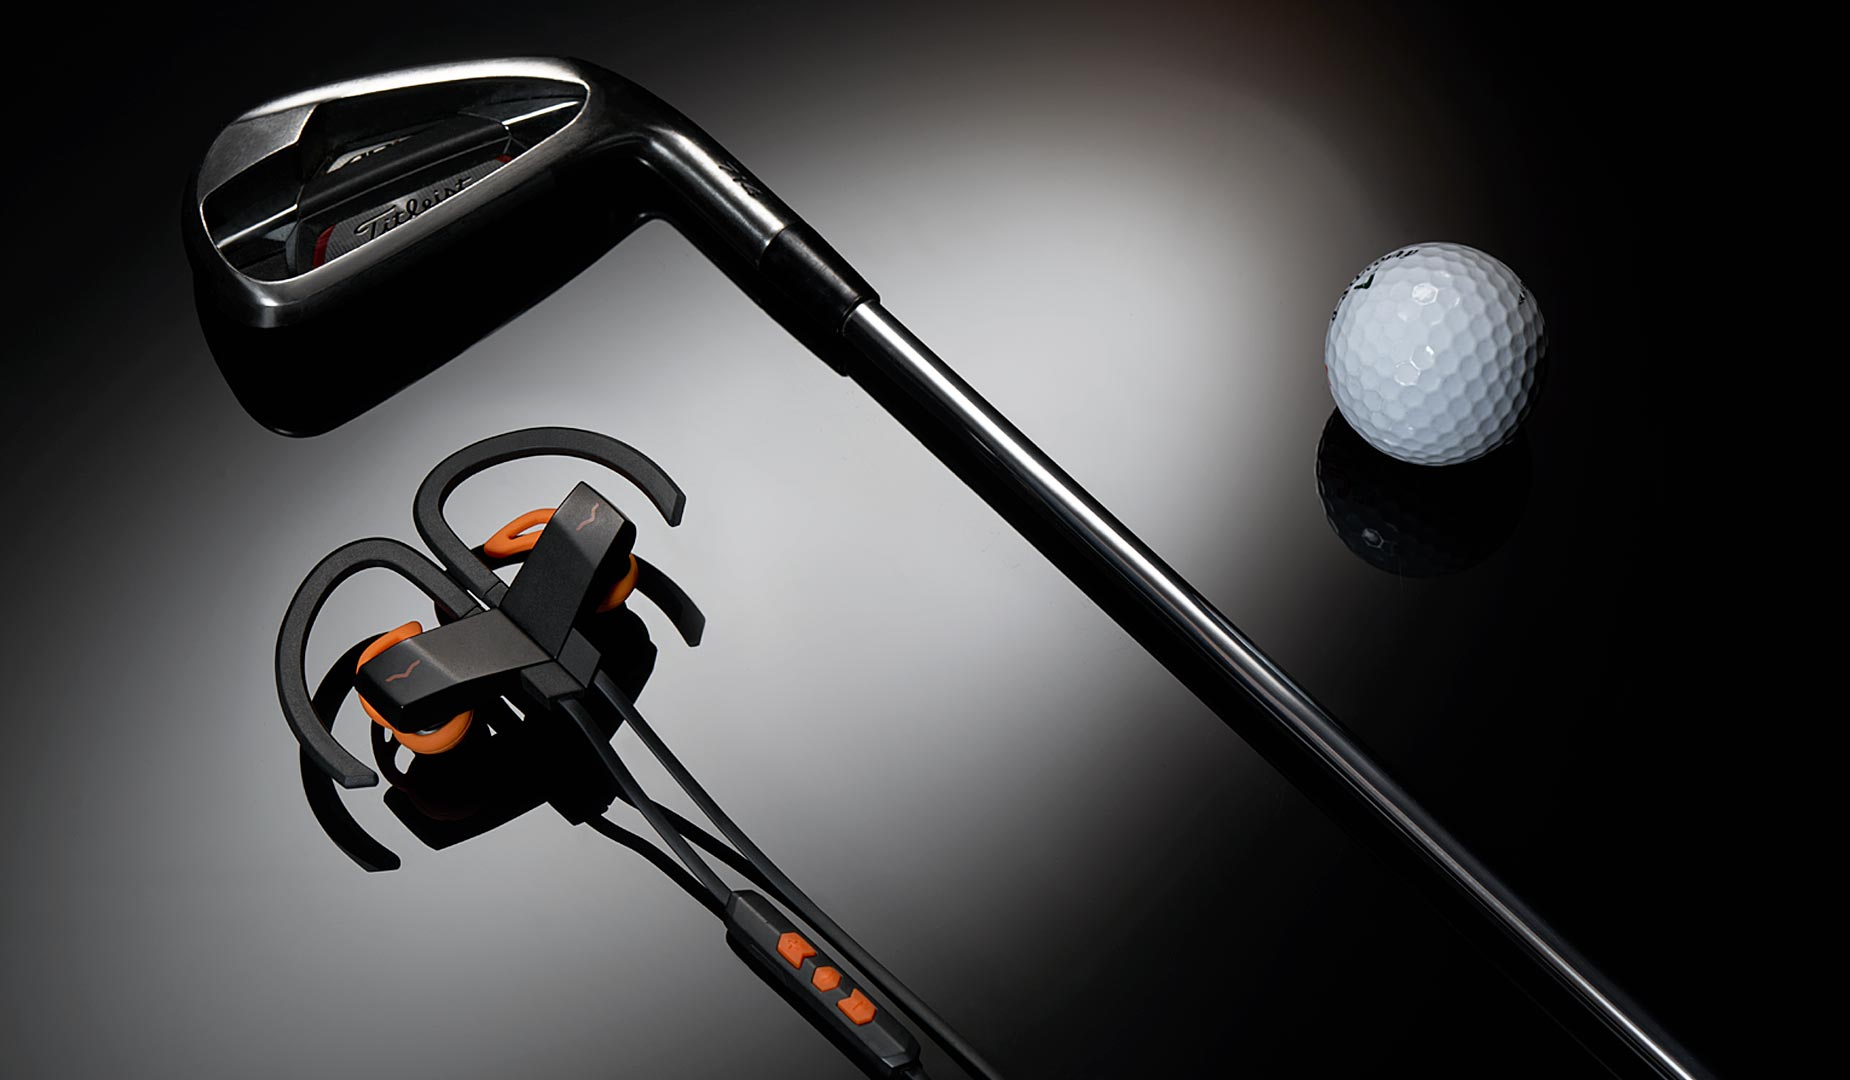 BassFit Golf